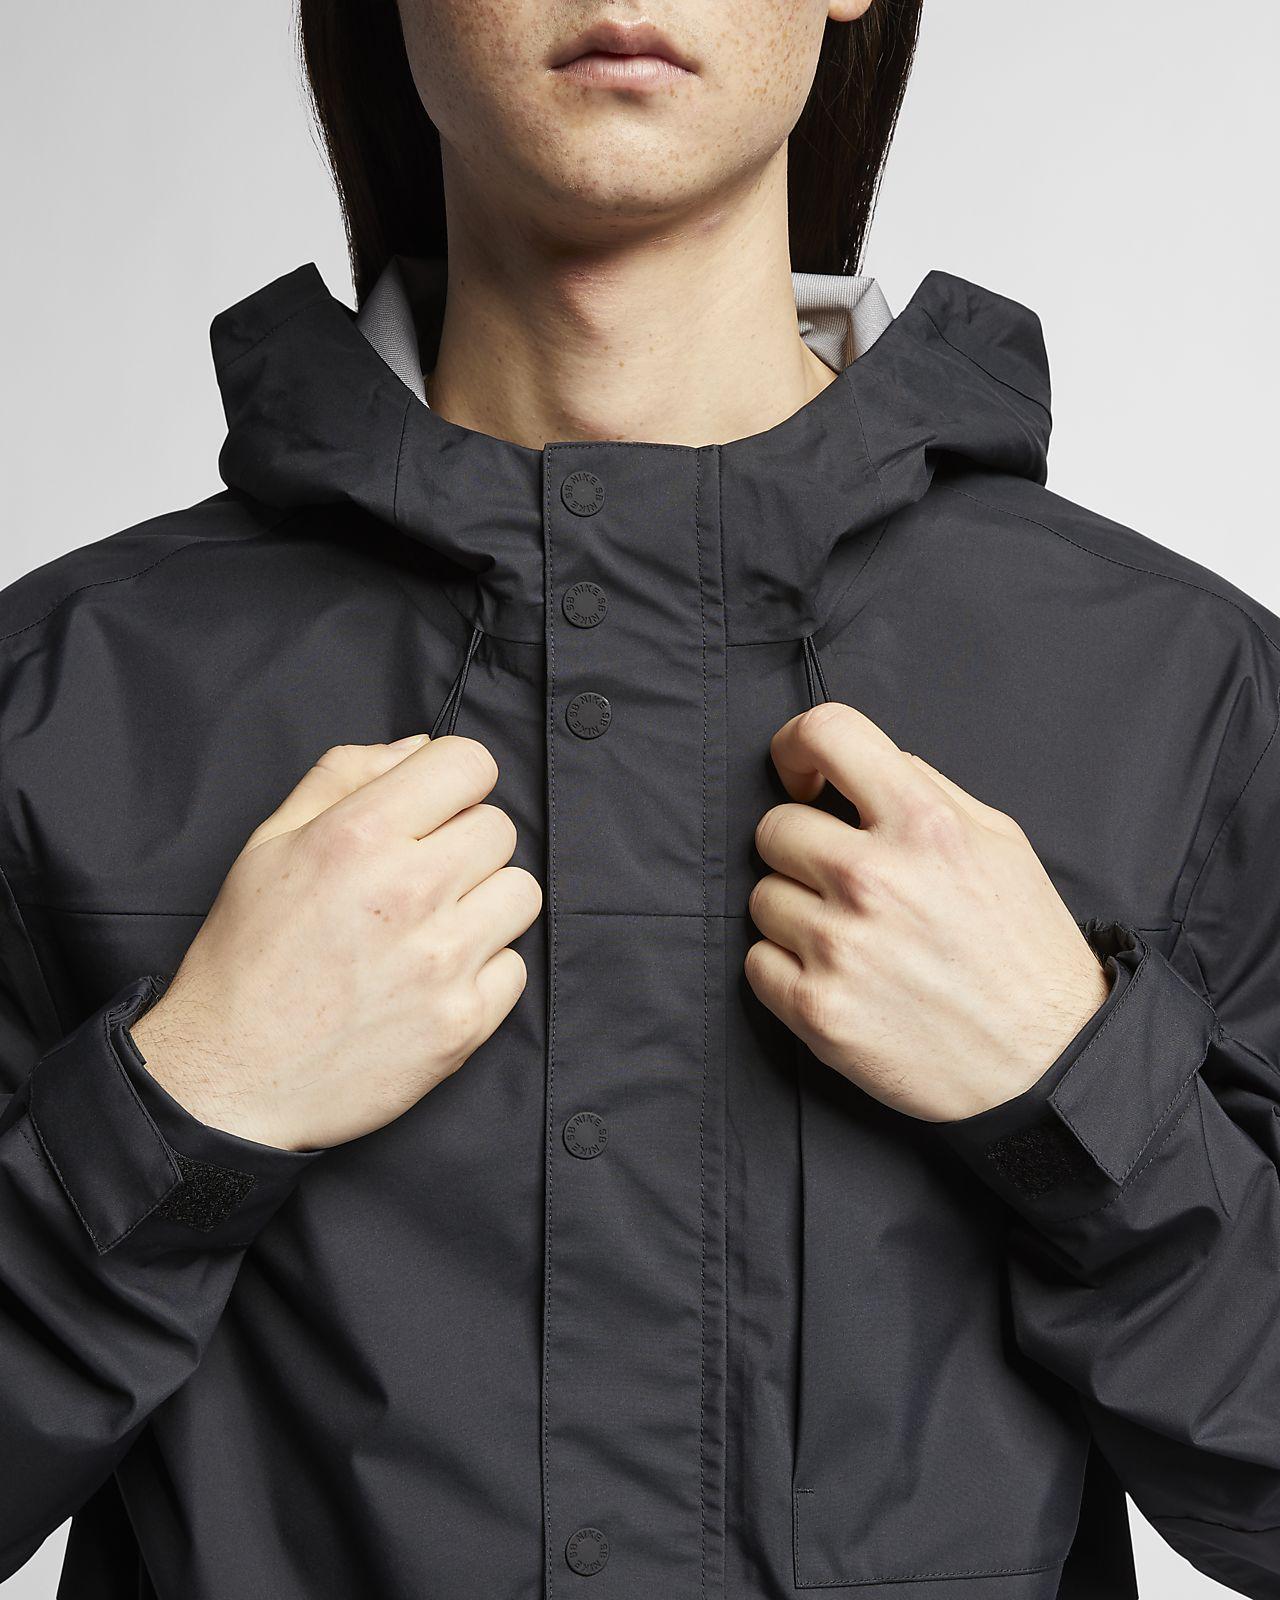 52136048ac85 Nike SB Shield Men's Skateboarding Jacket